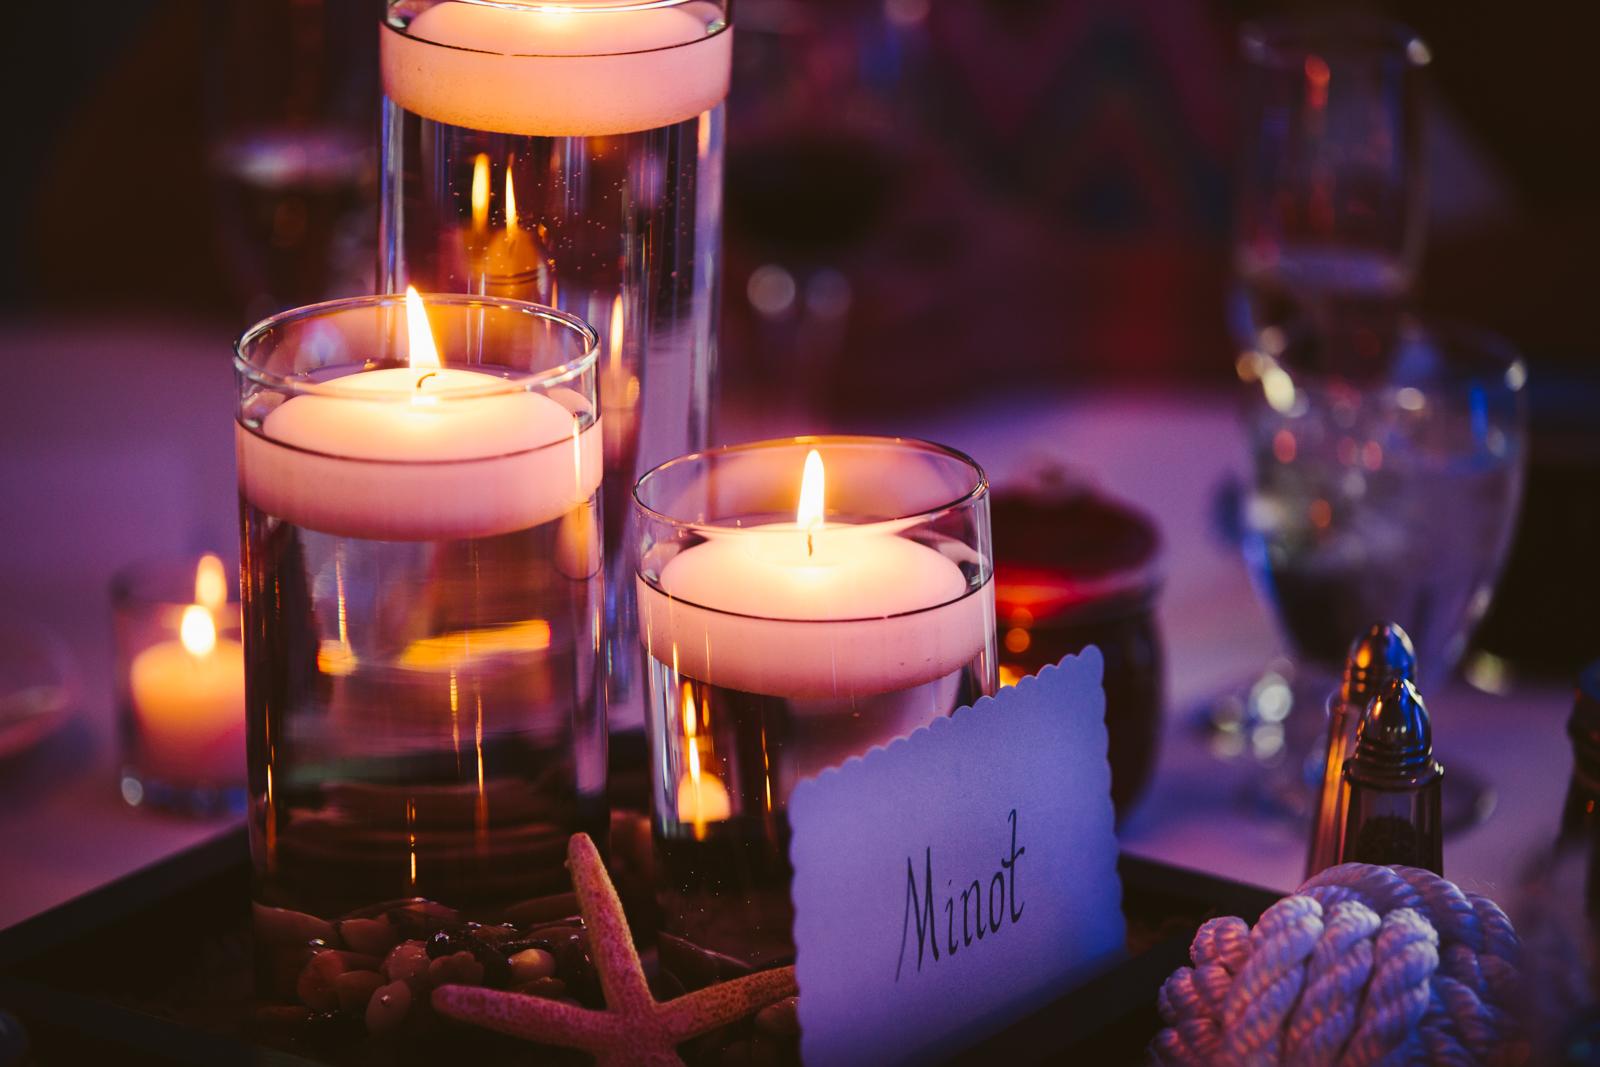 Eastons-Beach-Rotunda-Ballroom-Wedding-Newport-Rhode-Island-PhotographybyAmandaMorgan-100.jpg